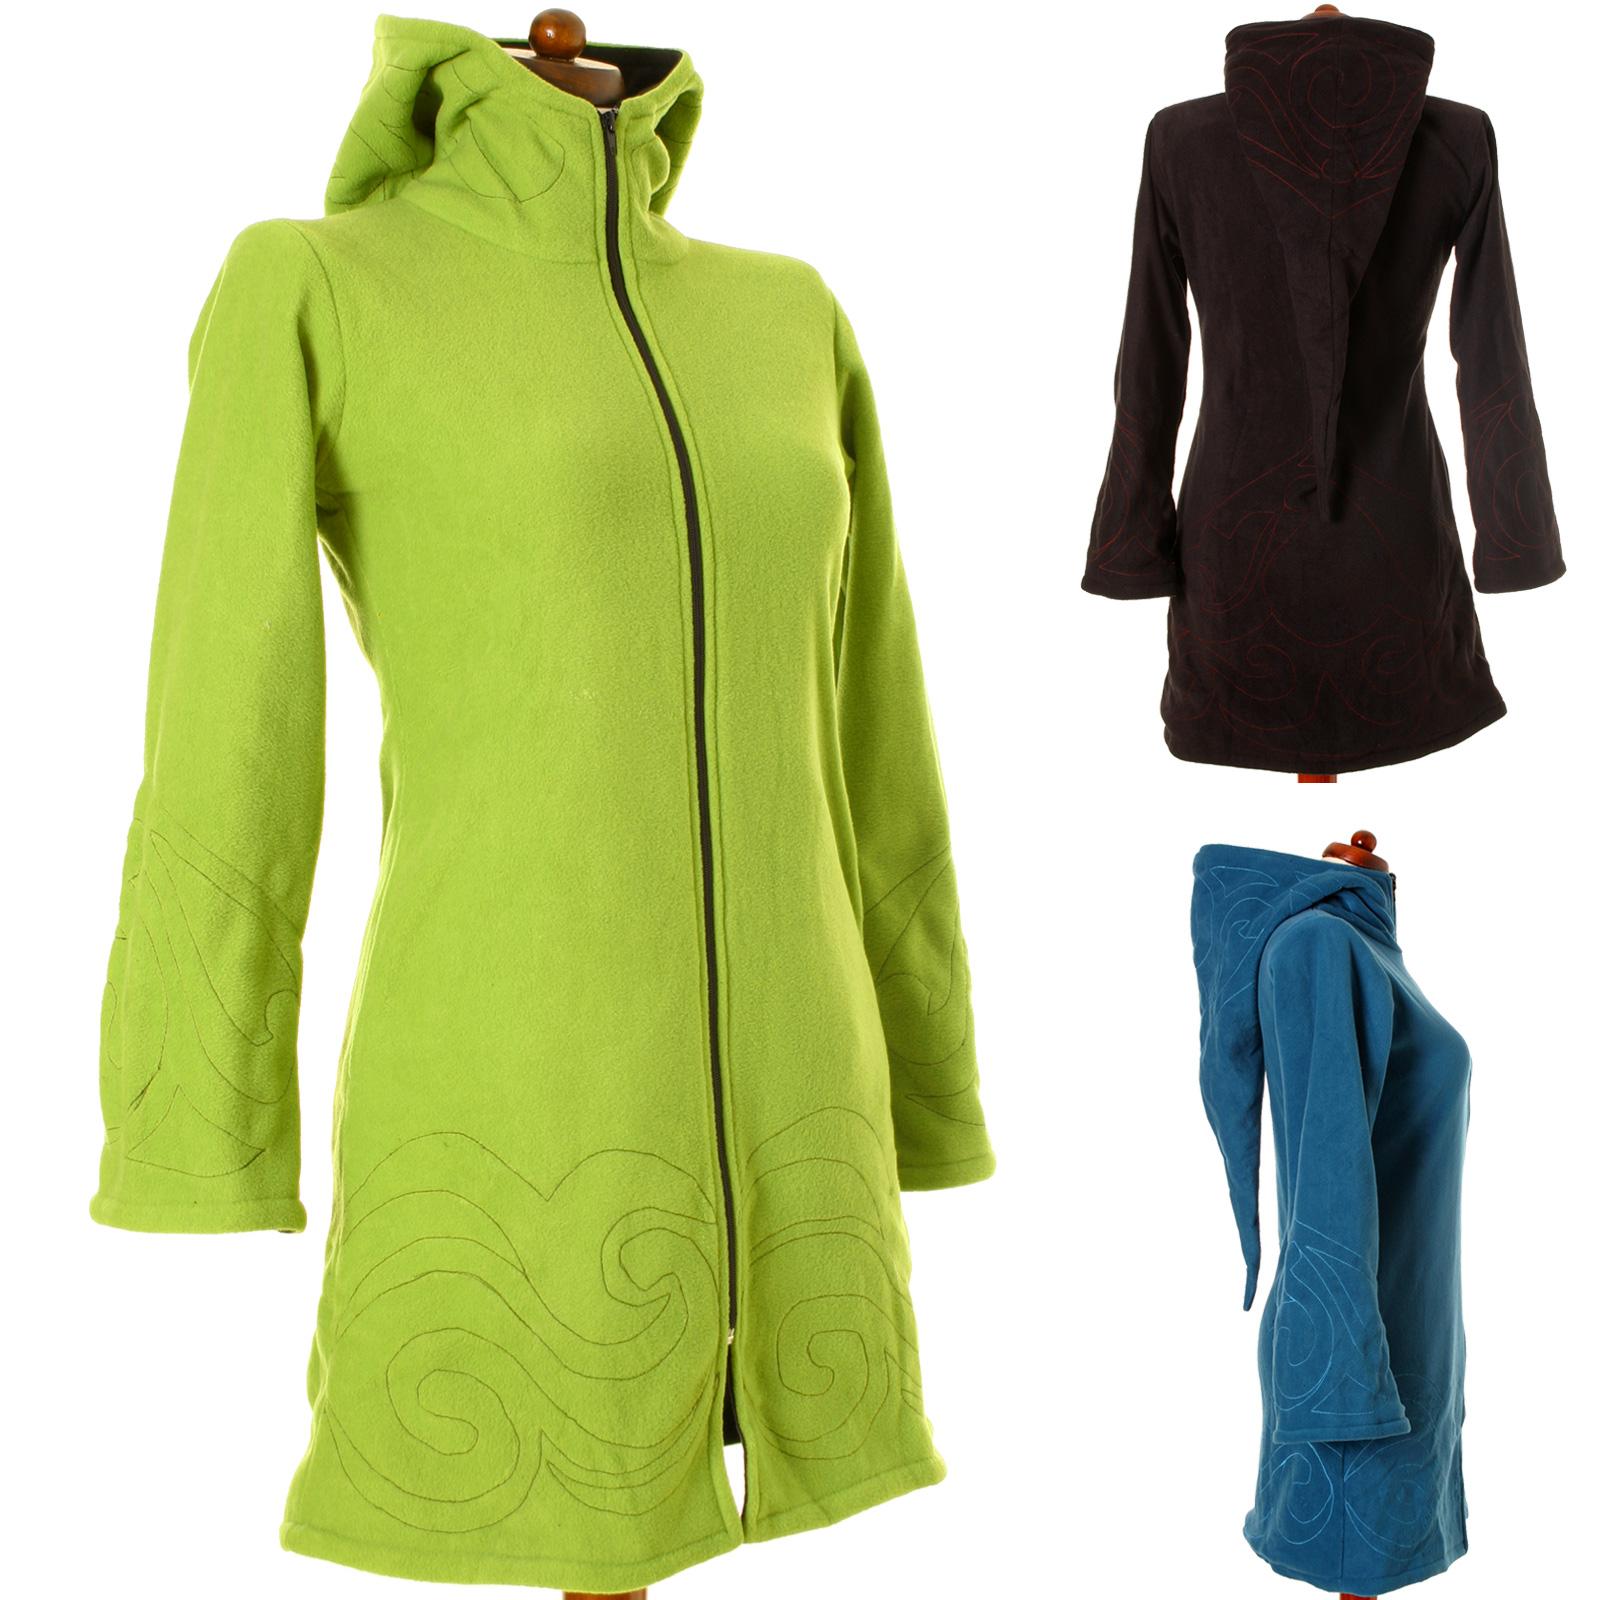 vishes fleece mantel stickerei boho wintermantel warm. Black Bedroom Furniture Sets. Home Design Ideas